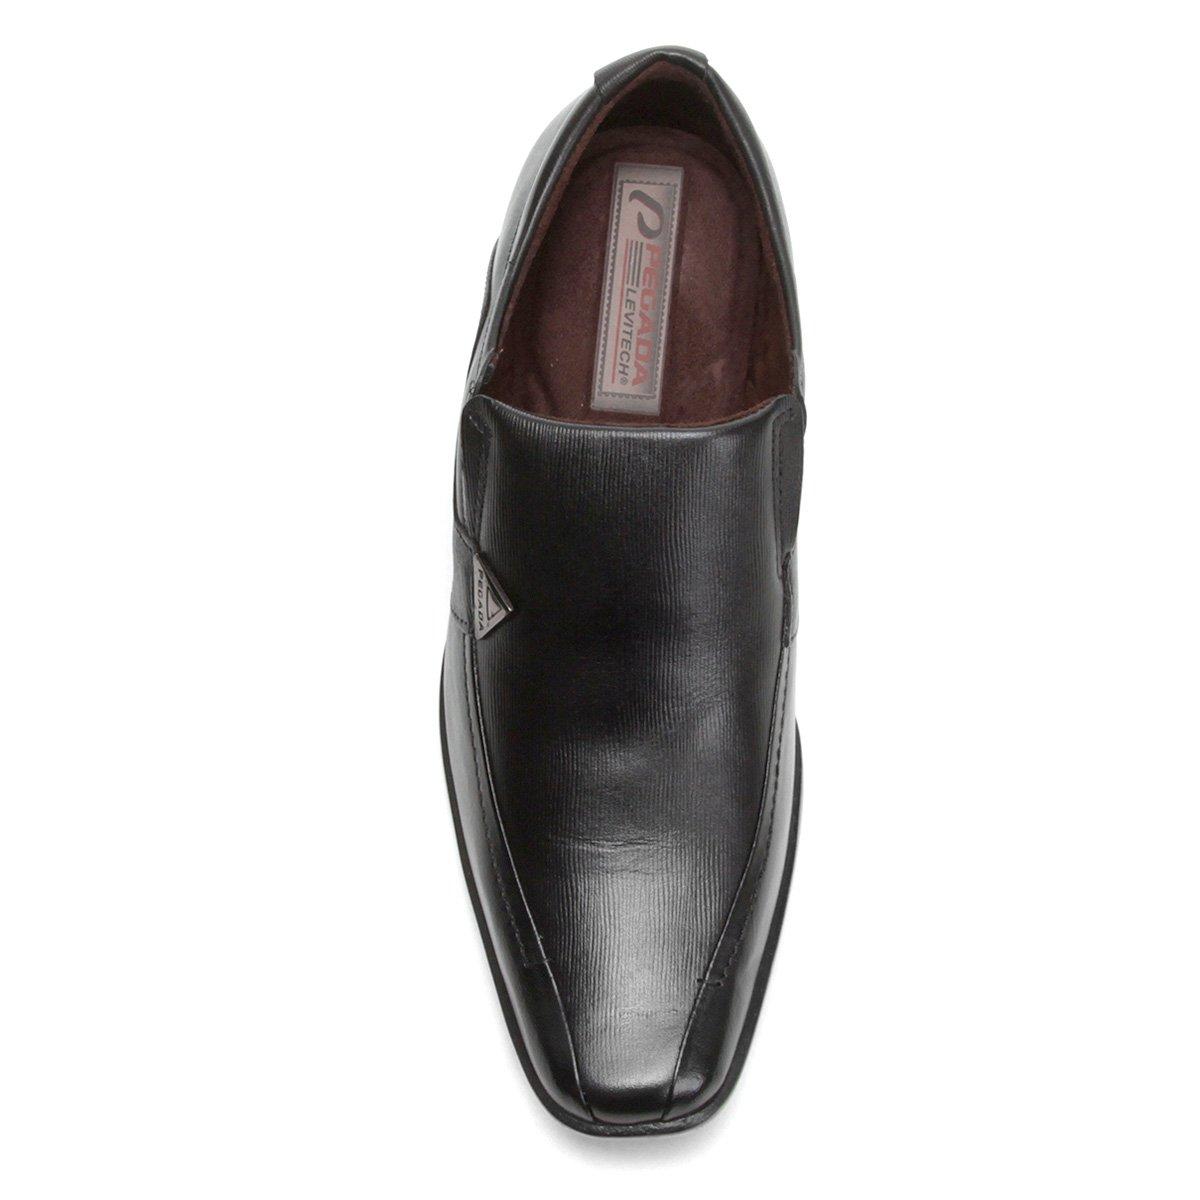 Quadrado Sapato Bico Couro Social Sapato Pegada Preto Social dqY7wXq